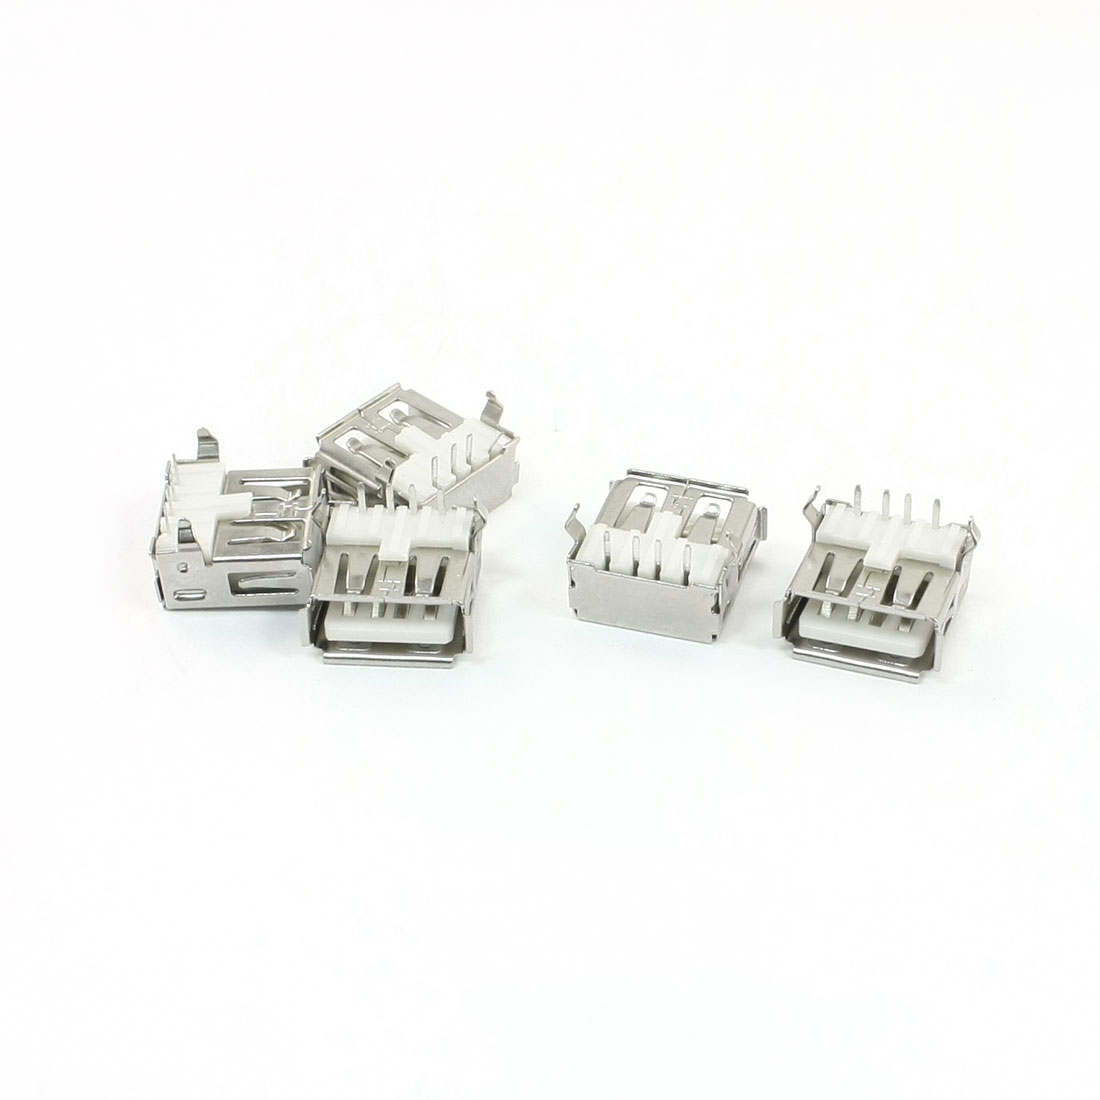 5 Pcs Desktop PC USB Type A Right Angle Female Connector PCB Socket